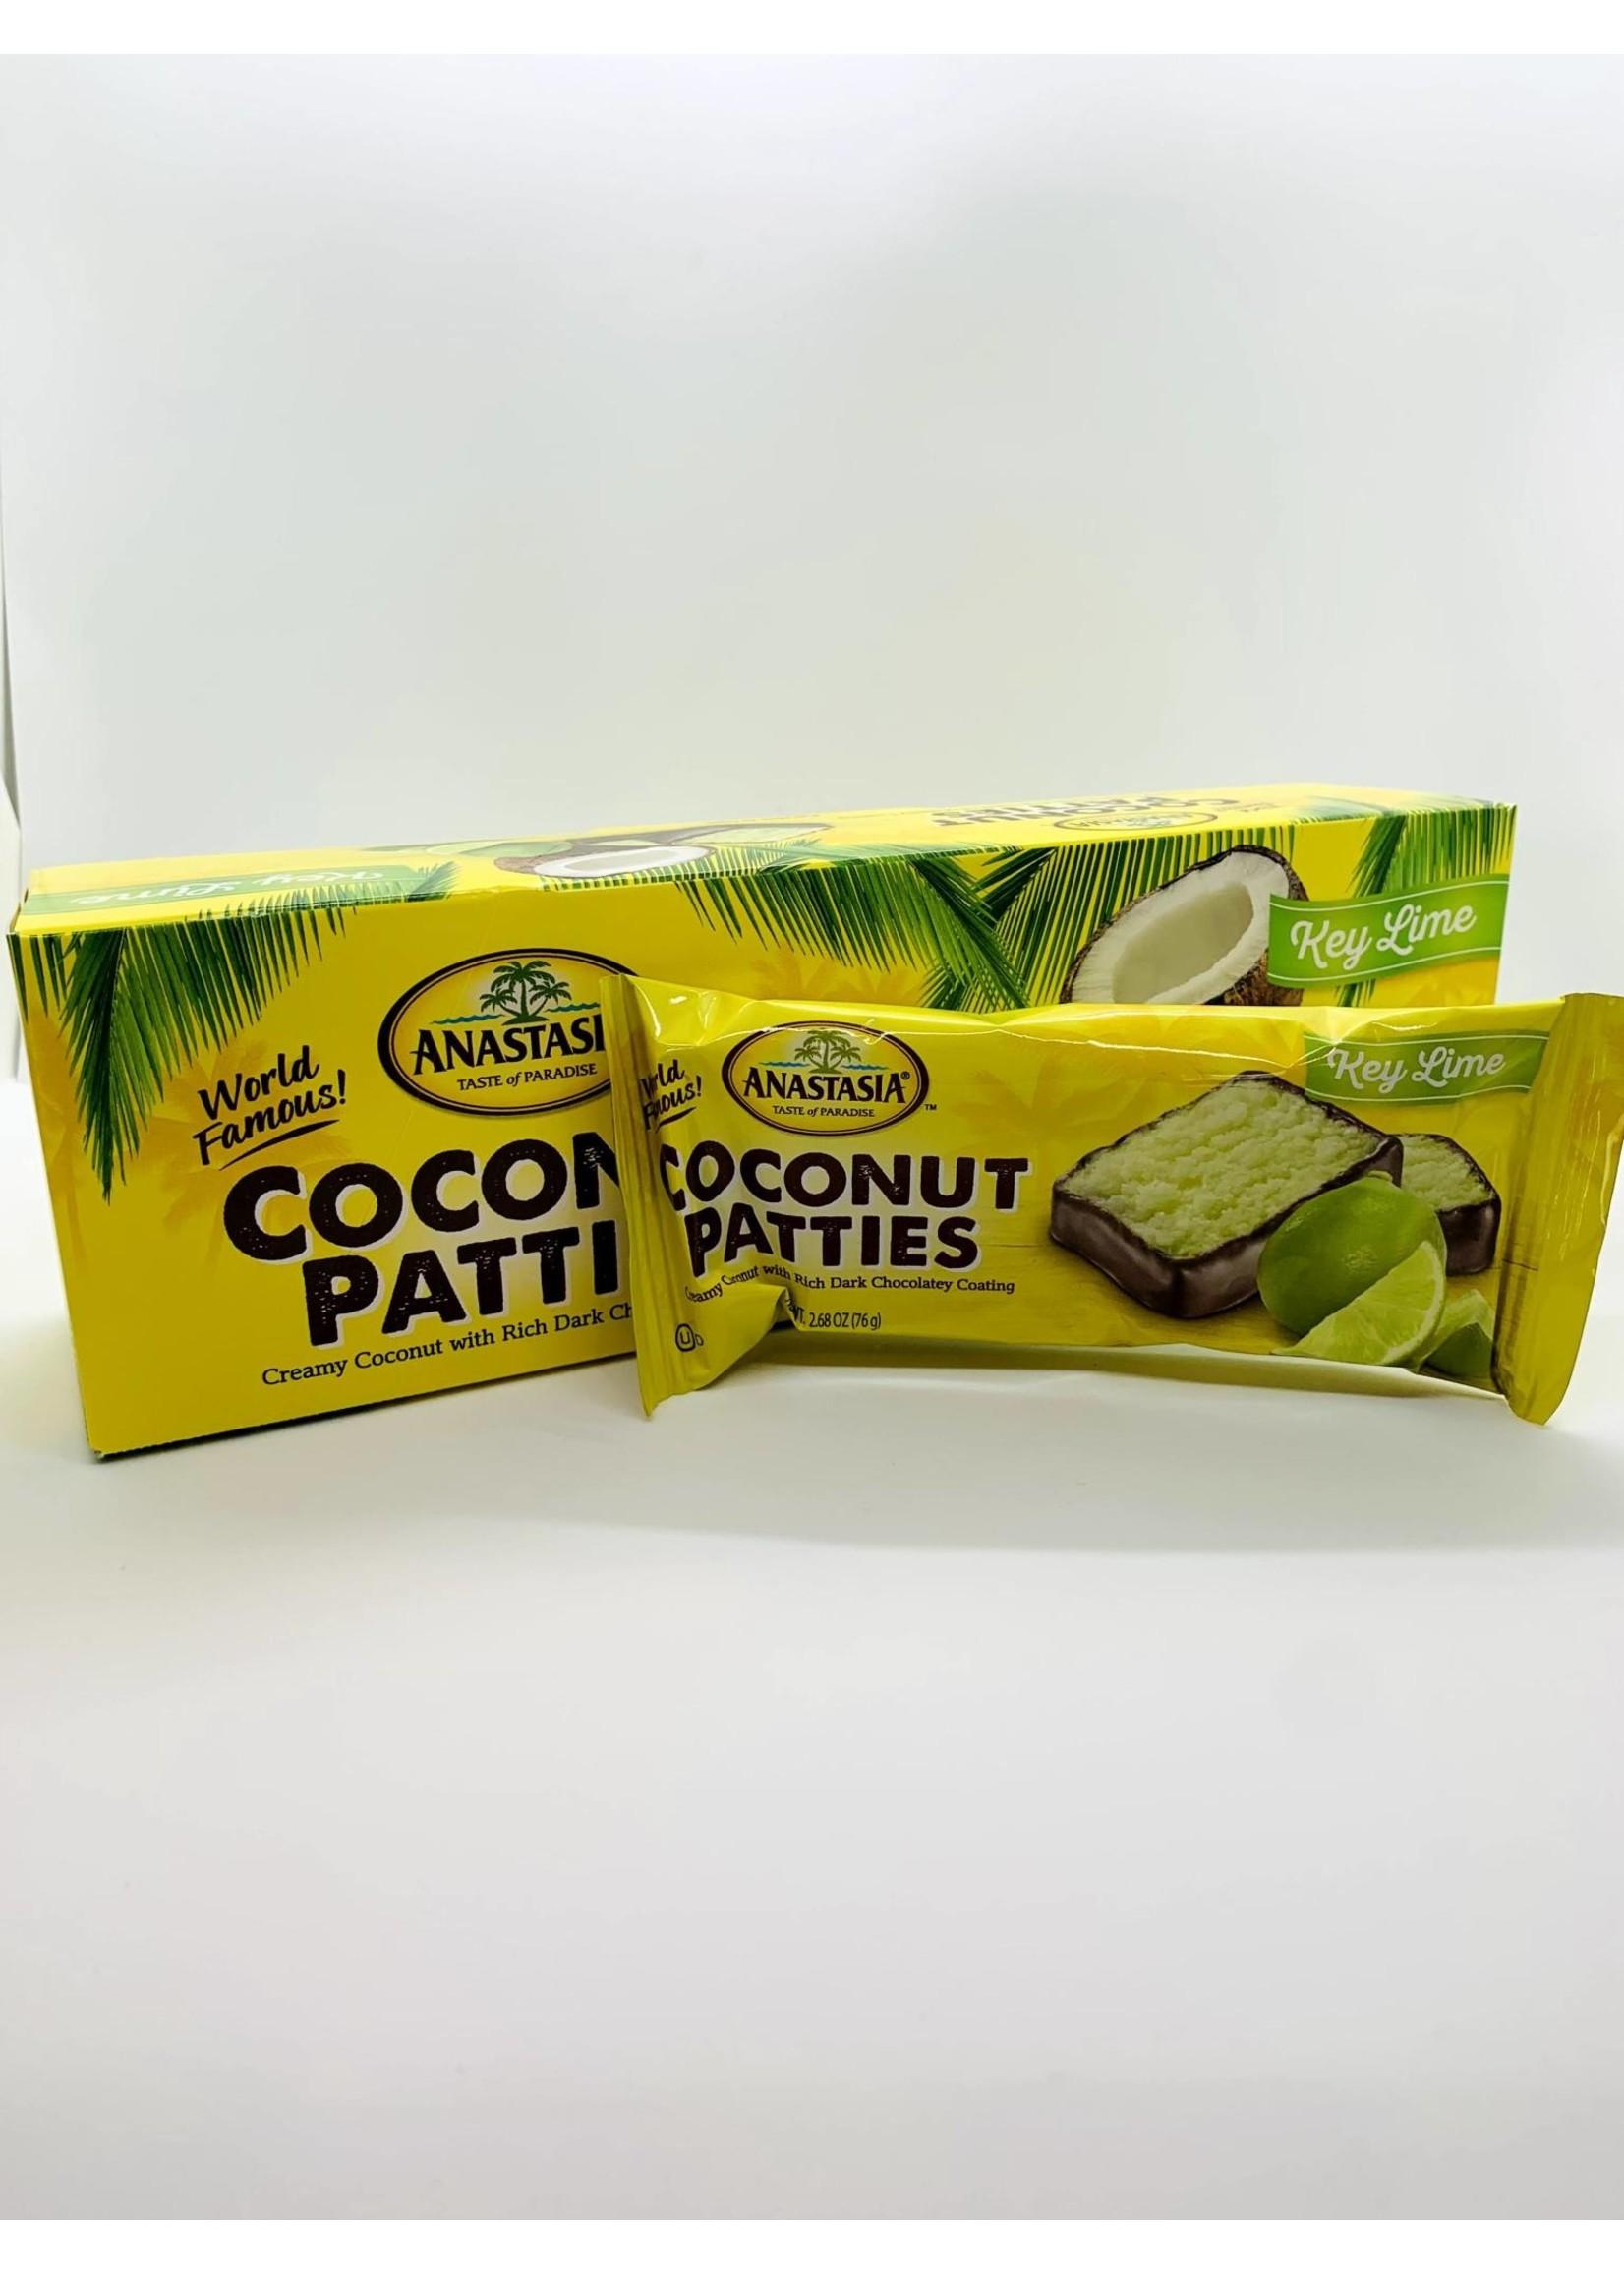 Key Lime Coconut Patties